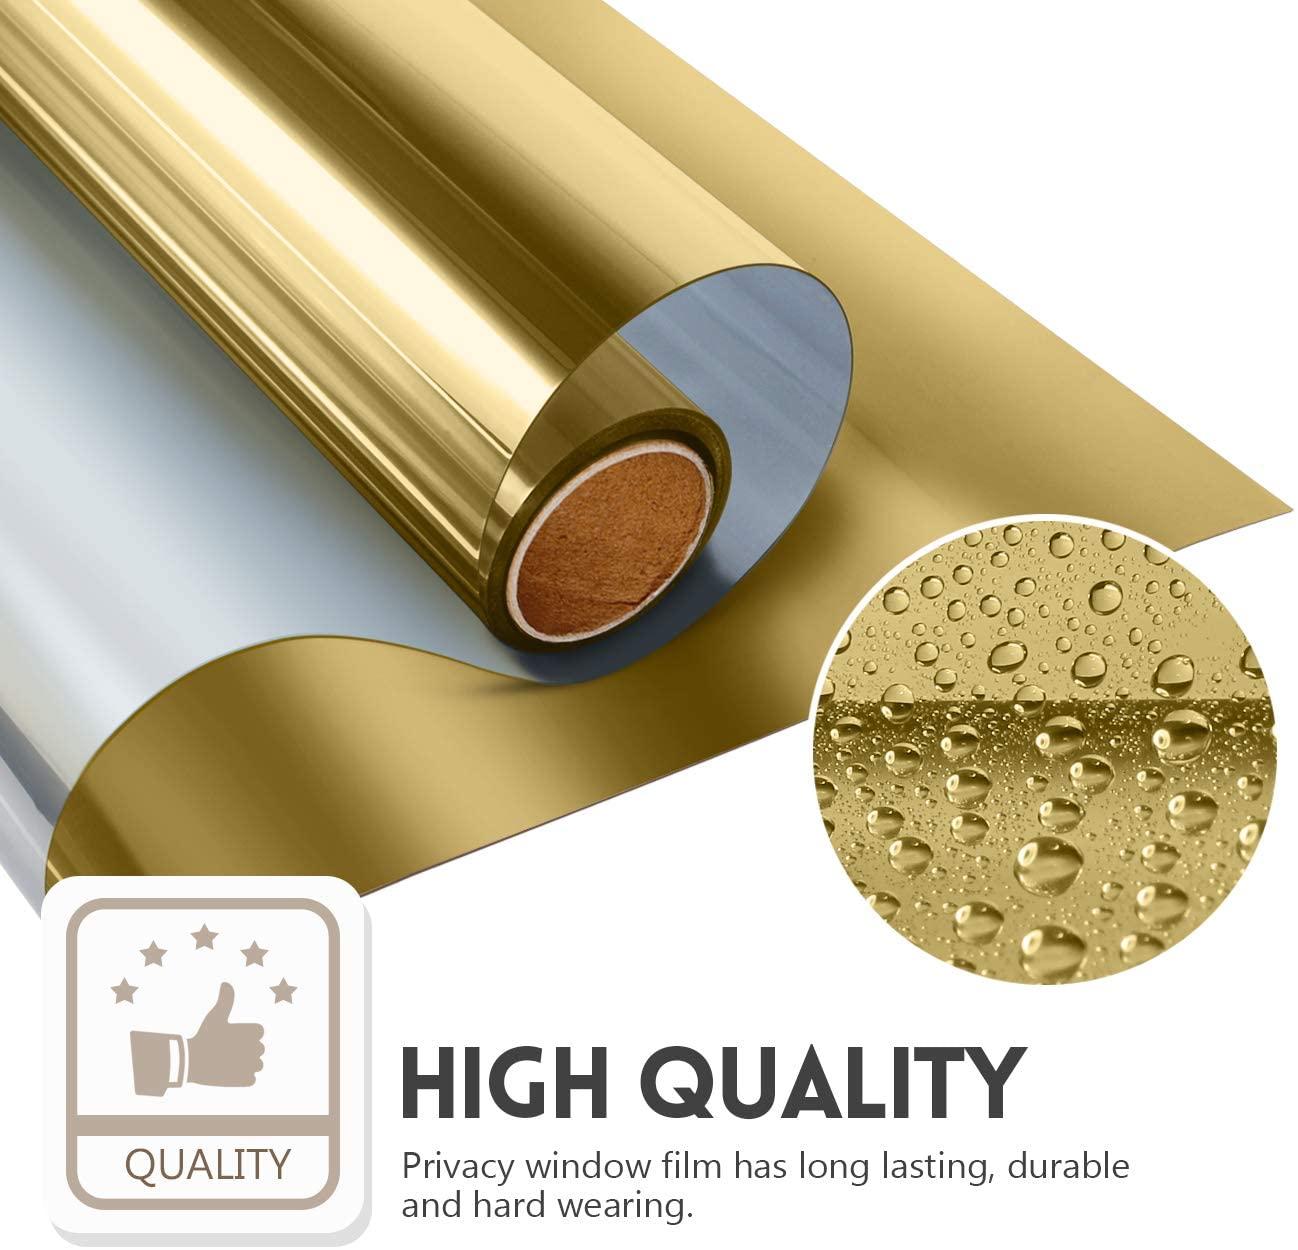 One Way Window Film Privacy Anti-UV Window Sticker Heat Control Reflective Glass Tint for Home Self Adhesive Vinyl Film (Gold) 1